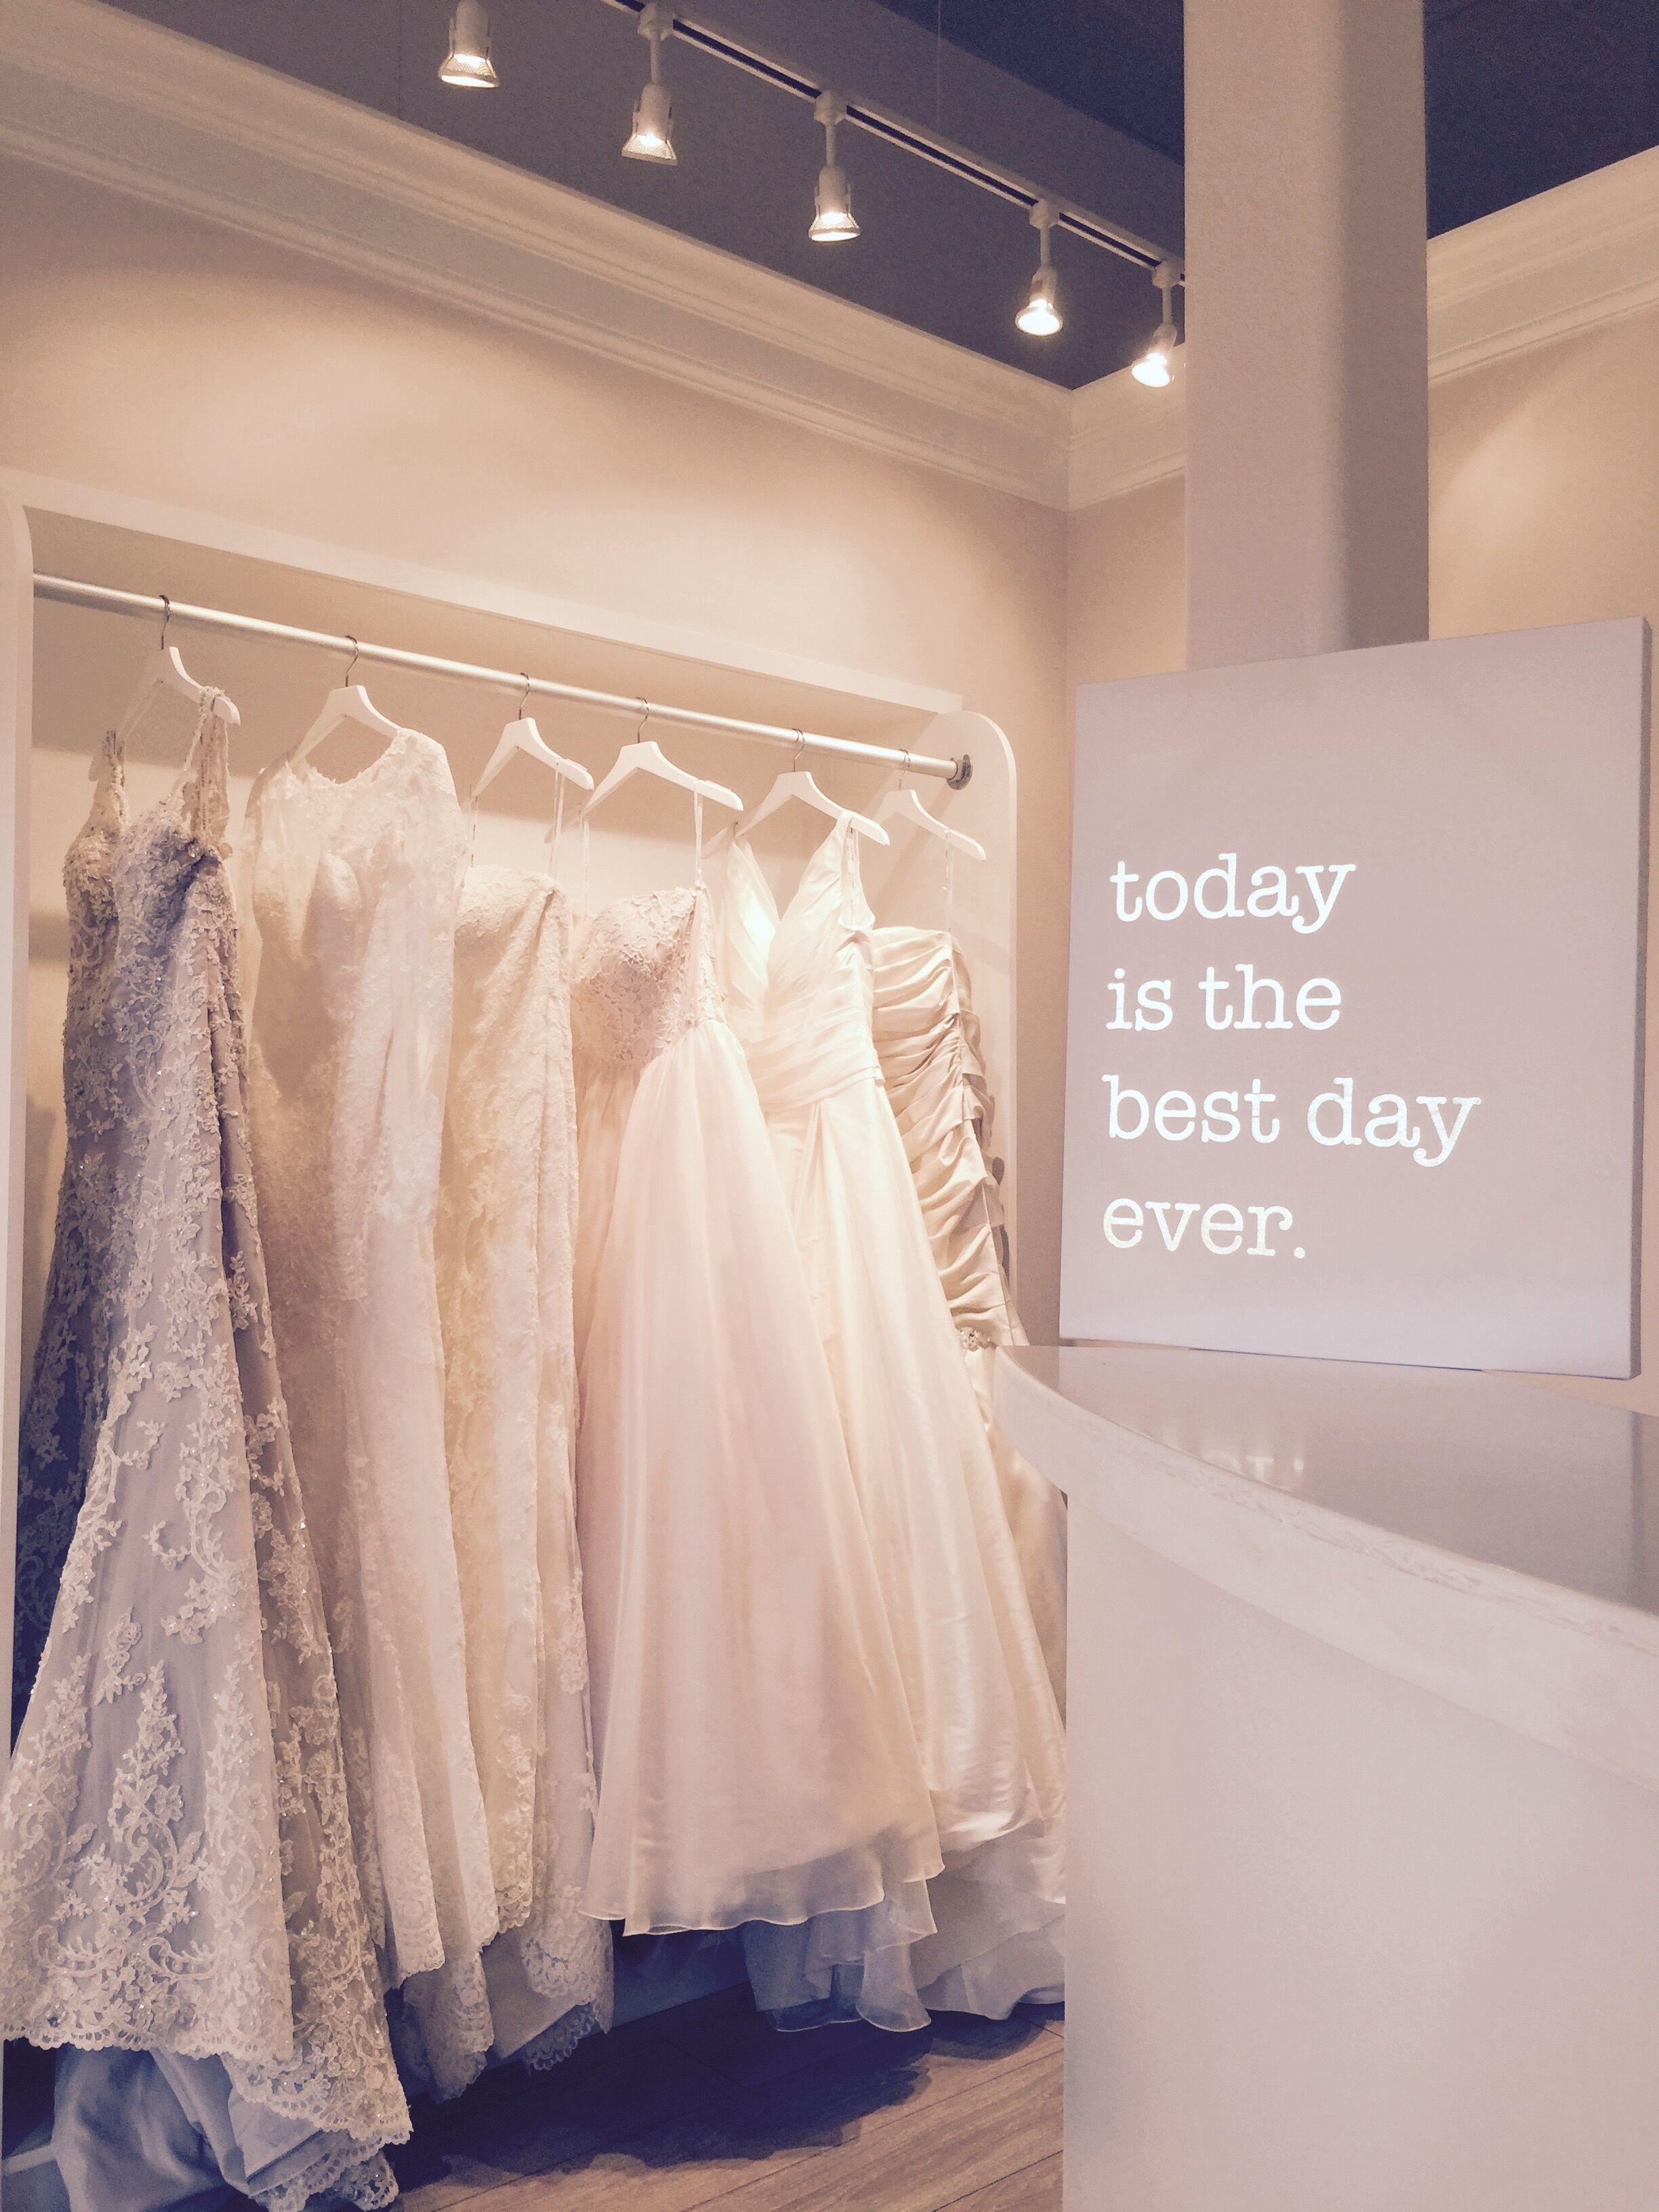 ec54d28bdd45 Louise Christine Bridal Boutique   Bridal Salons - Dayton, OH